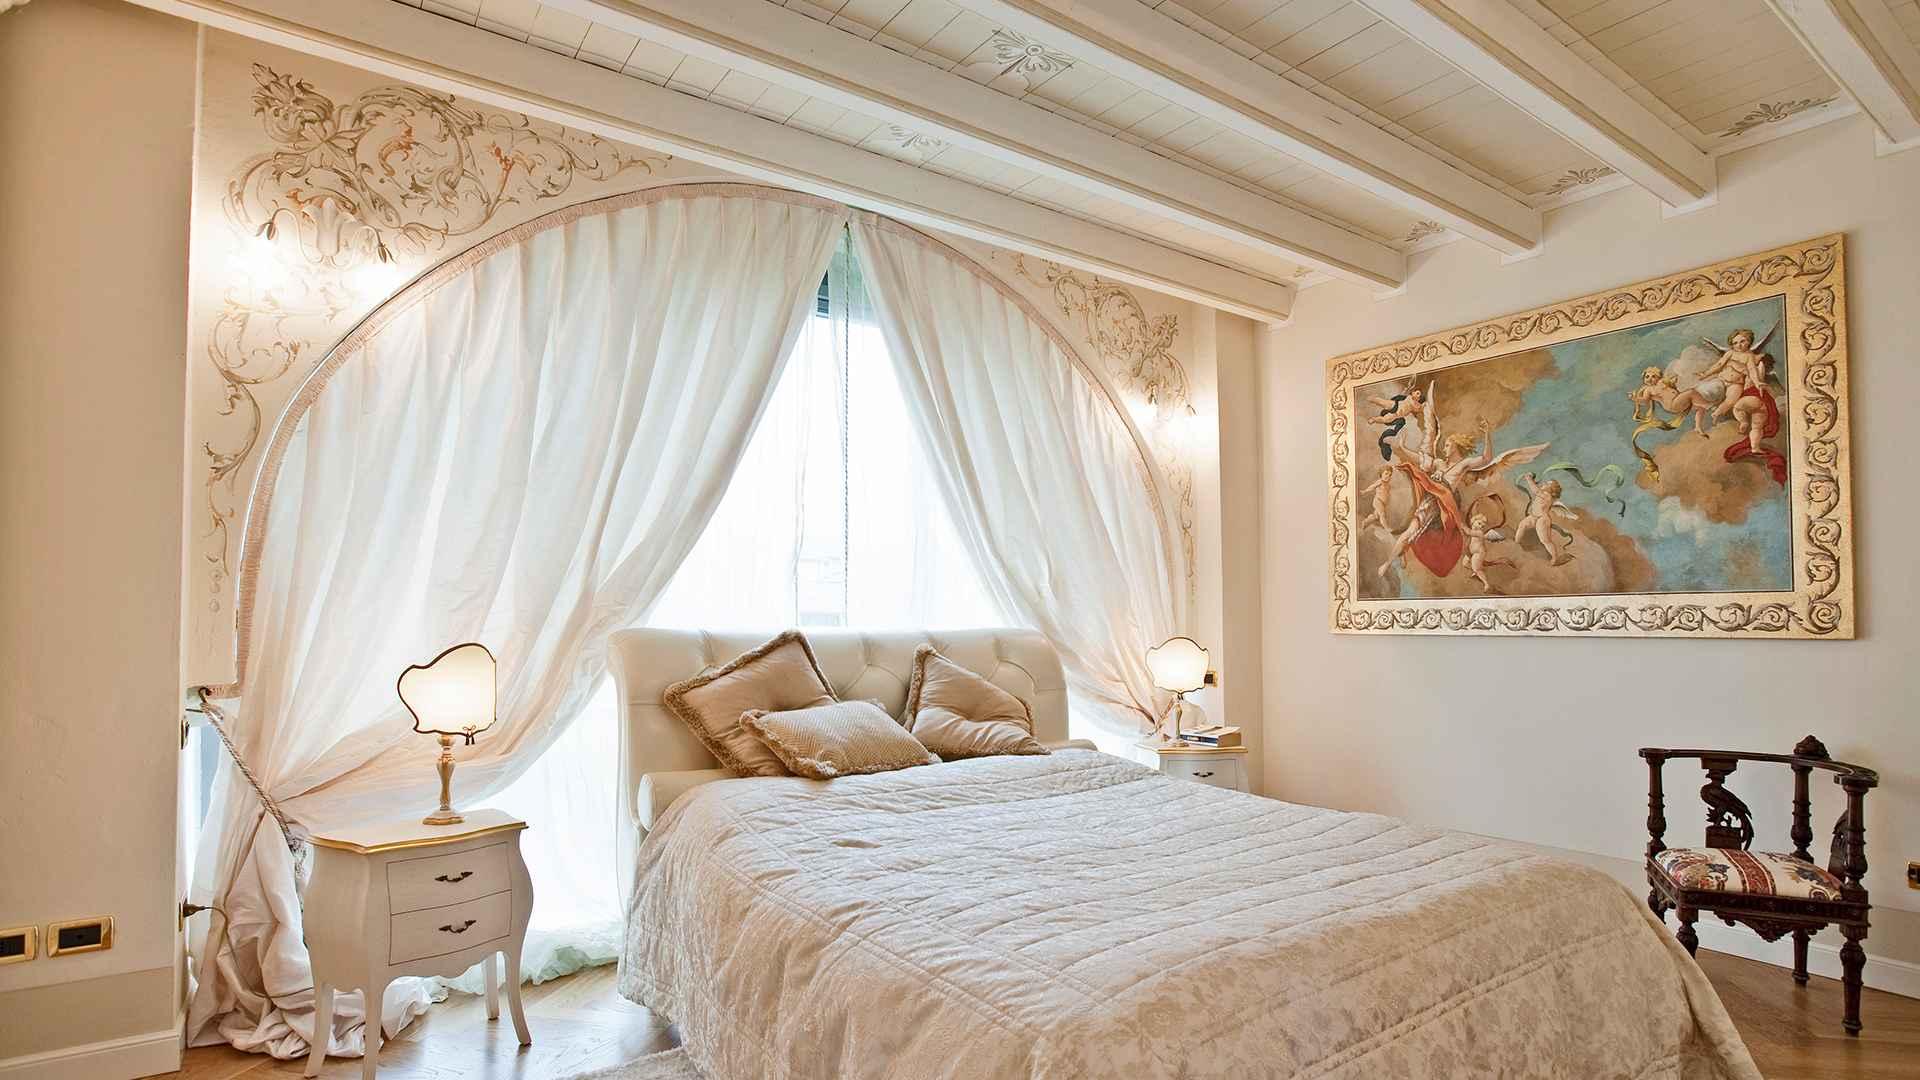 Mariani affreschi mariani affreschi frescos trompe l - Camere da letto romantiche ...